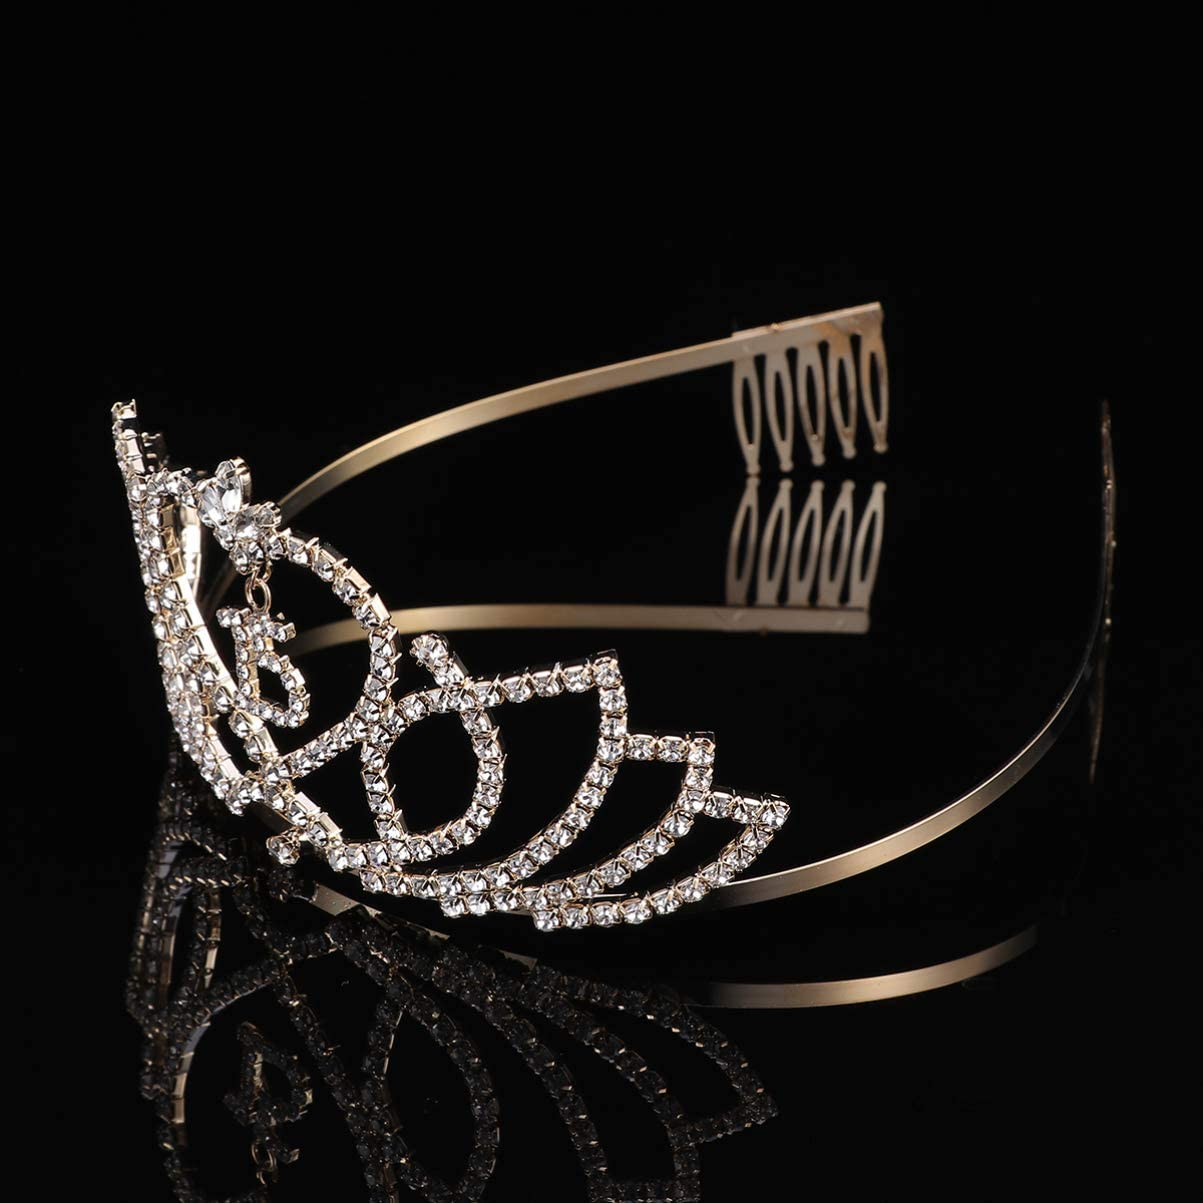 Lurrose Tiara de Cumplea/ños de 15 A/ños de Cristal Corona de Princesa Diadema de Fiesta Cumplea/ños para Ni/ñas